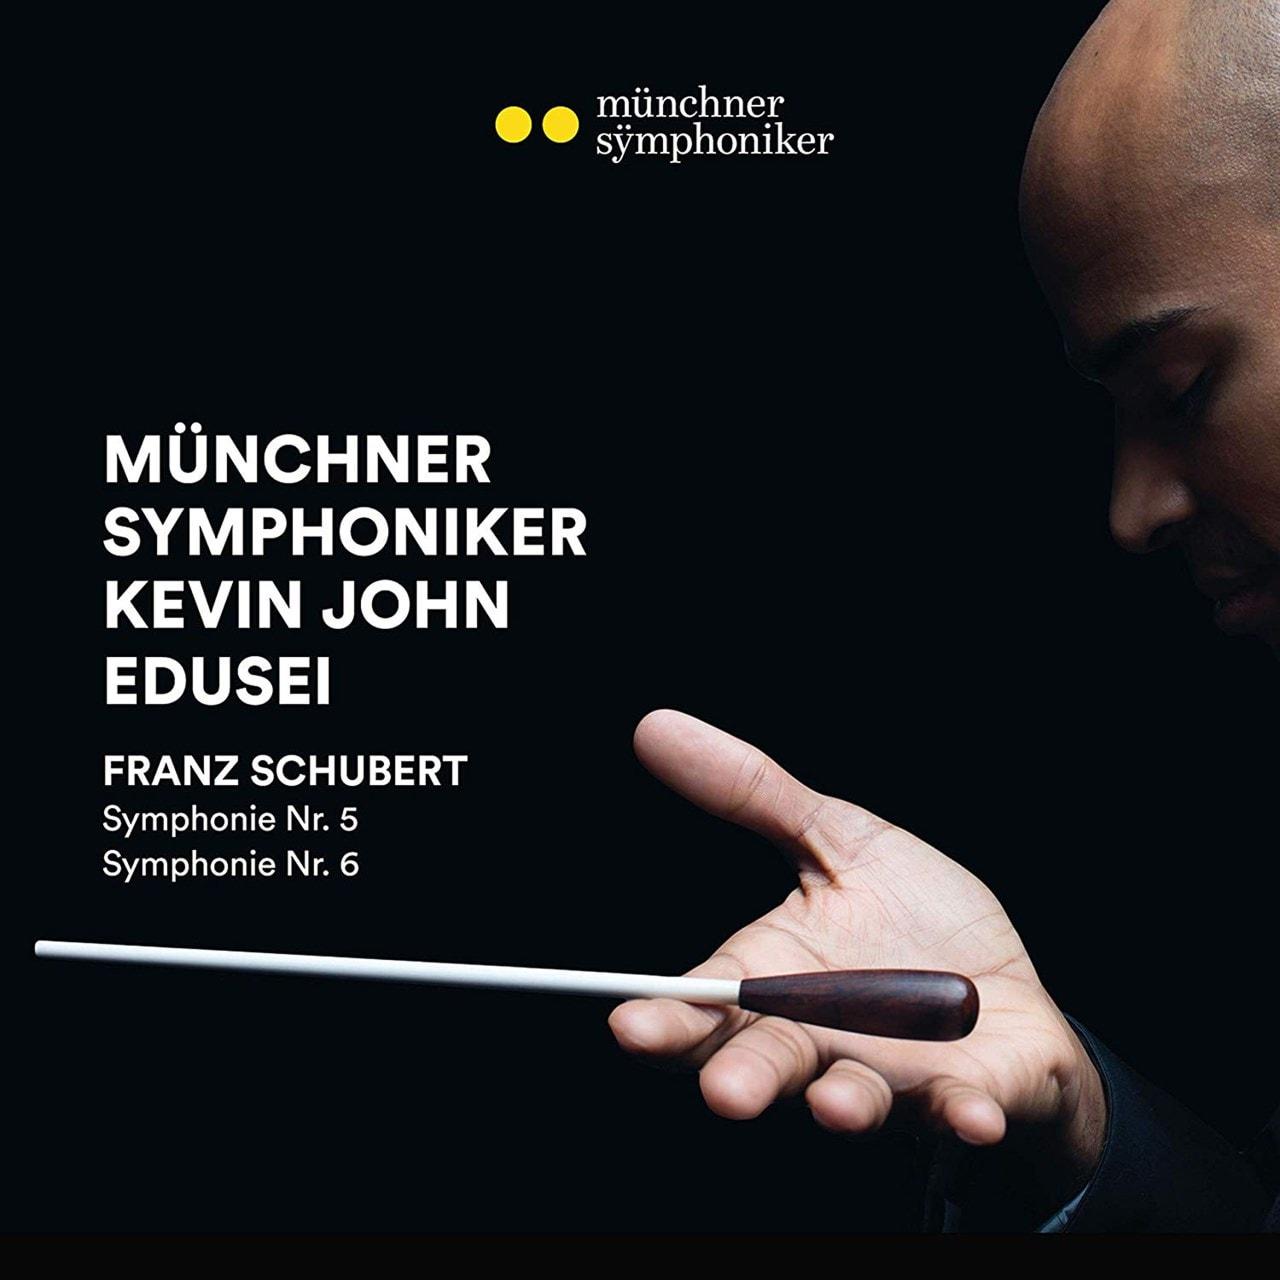 Franz Schubert: Symphonie Nr. 5/Symphonie Nr. 6 - 1